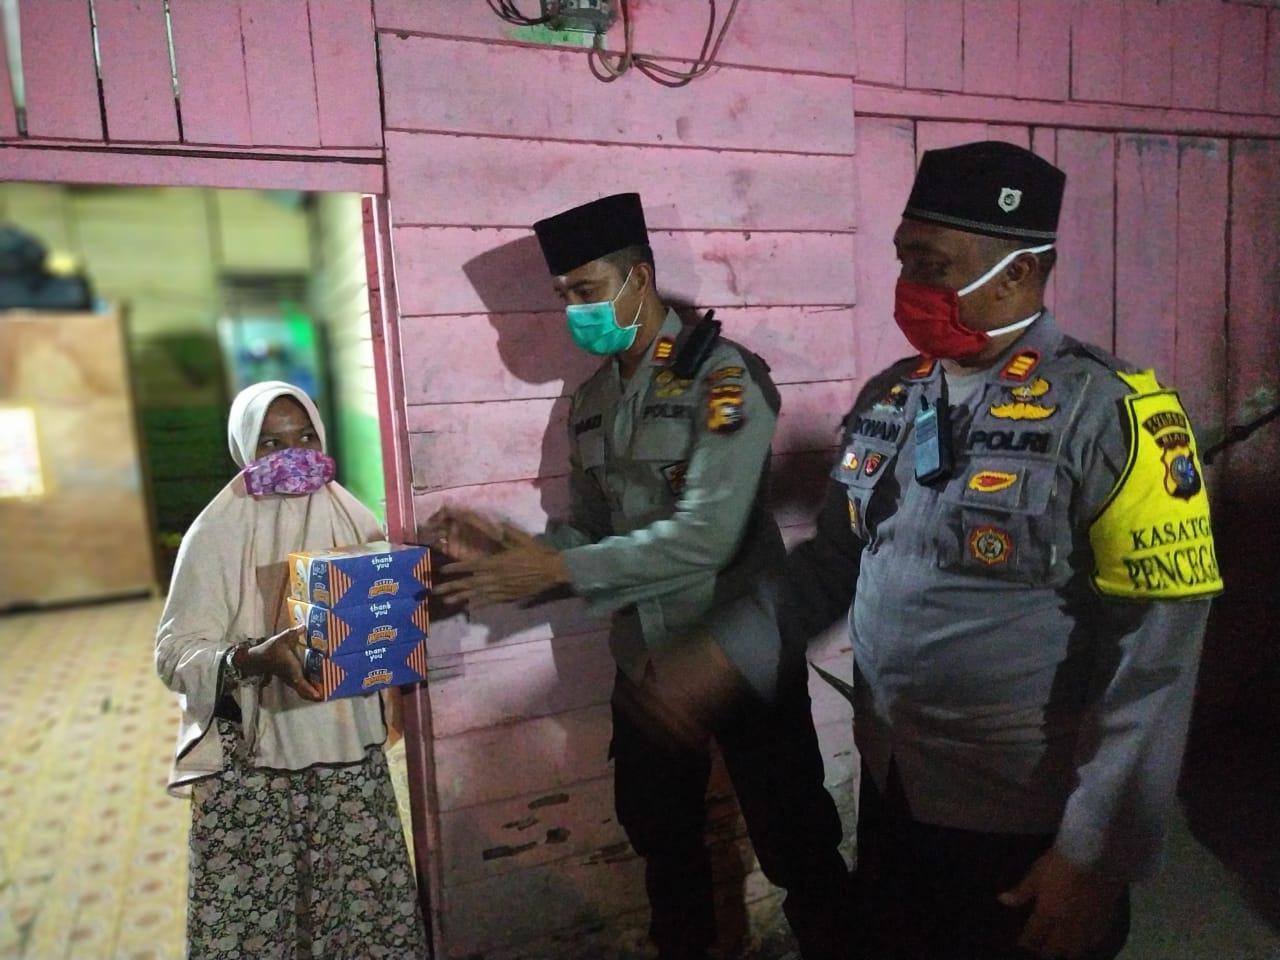 100 Nasi Kotak dari Polres Kampar Diantar Kerumah Warga Kurang Mampu untuk Sahur Pertama Ramadhan